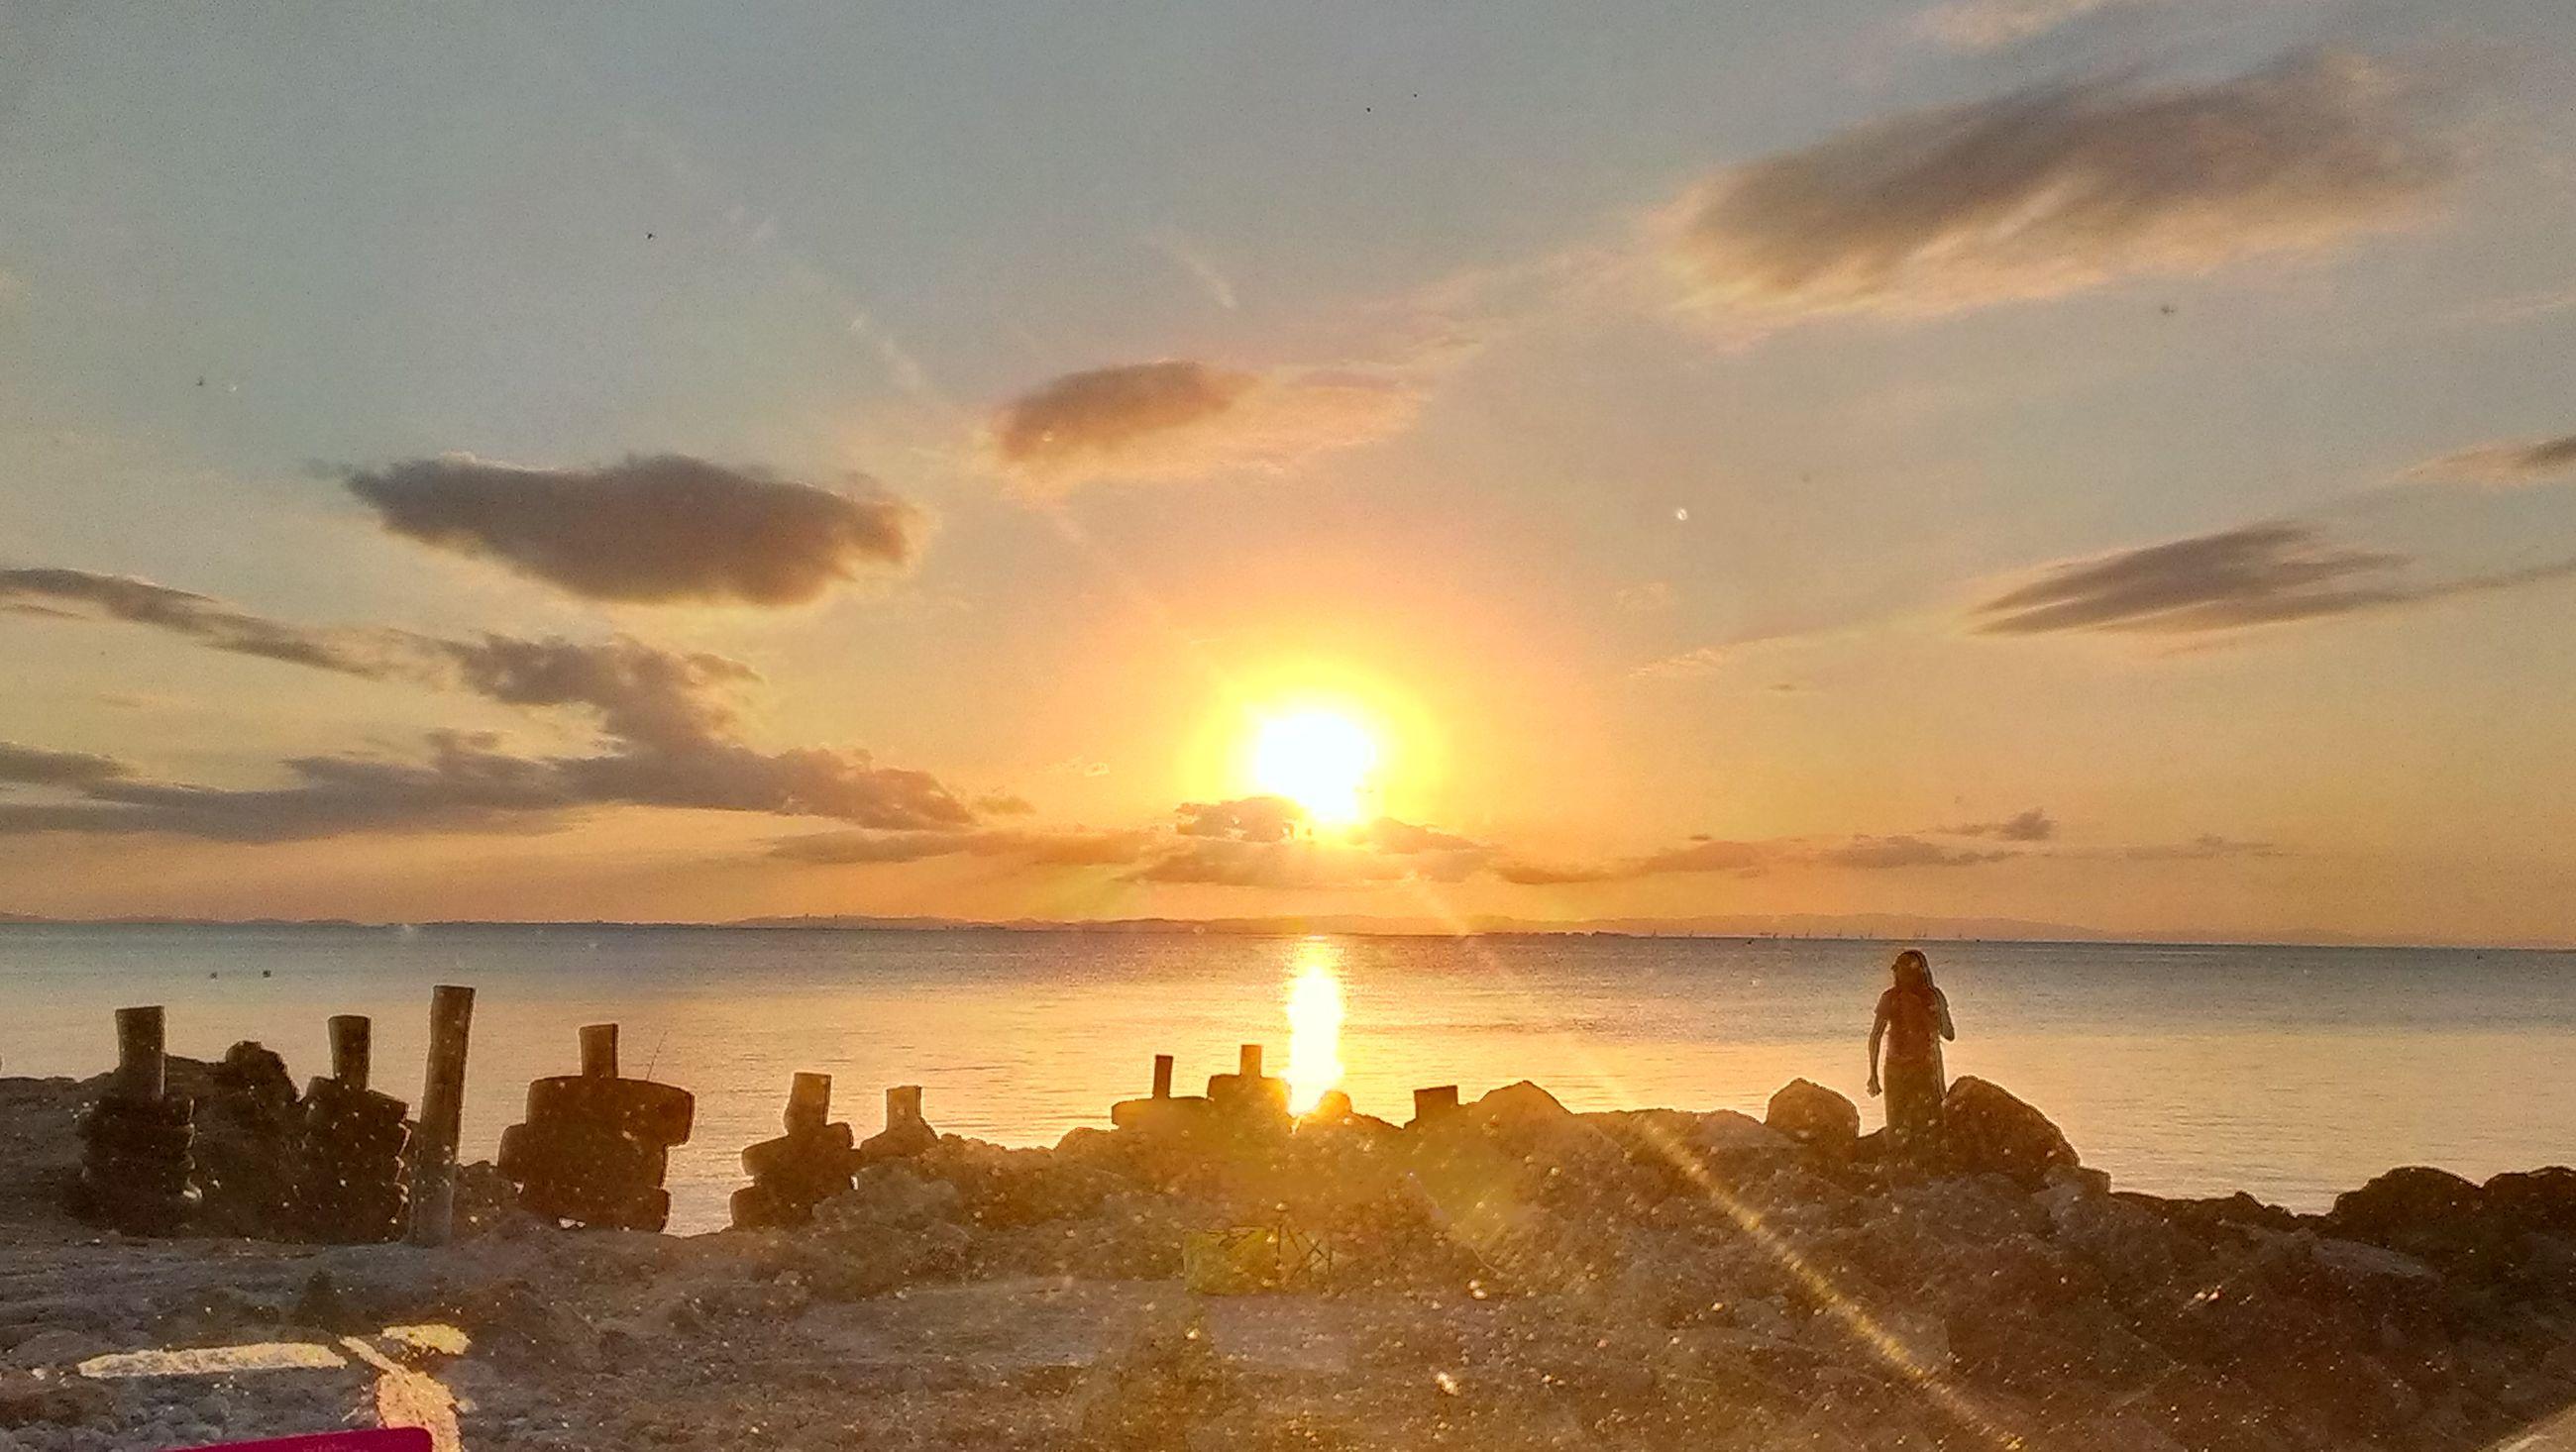 sunset, water, sea, sun, sky, lifestyles, leisure activity, beach, horizon over water, orange color, scenics, beauty in nature, person, men, shore, sunlight, nature, silhouette, cloud - sky